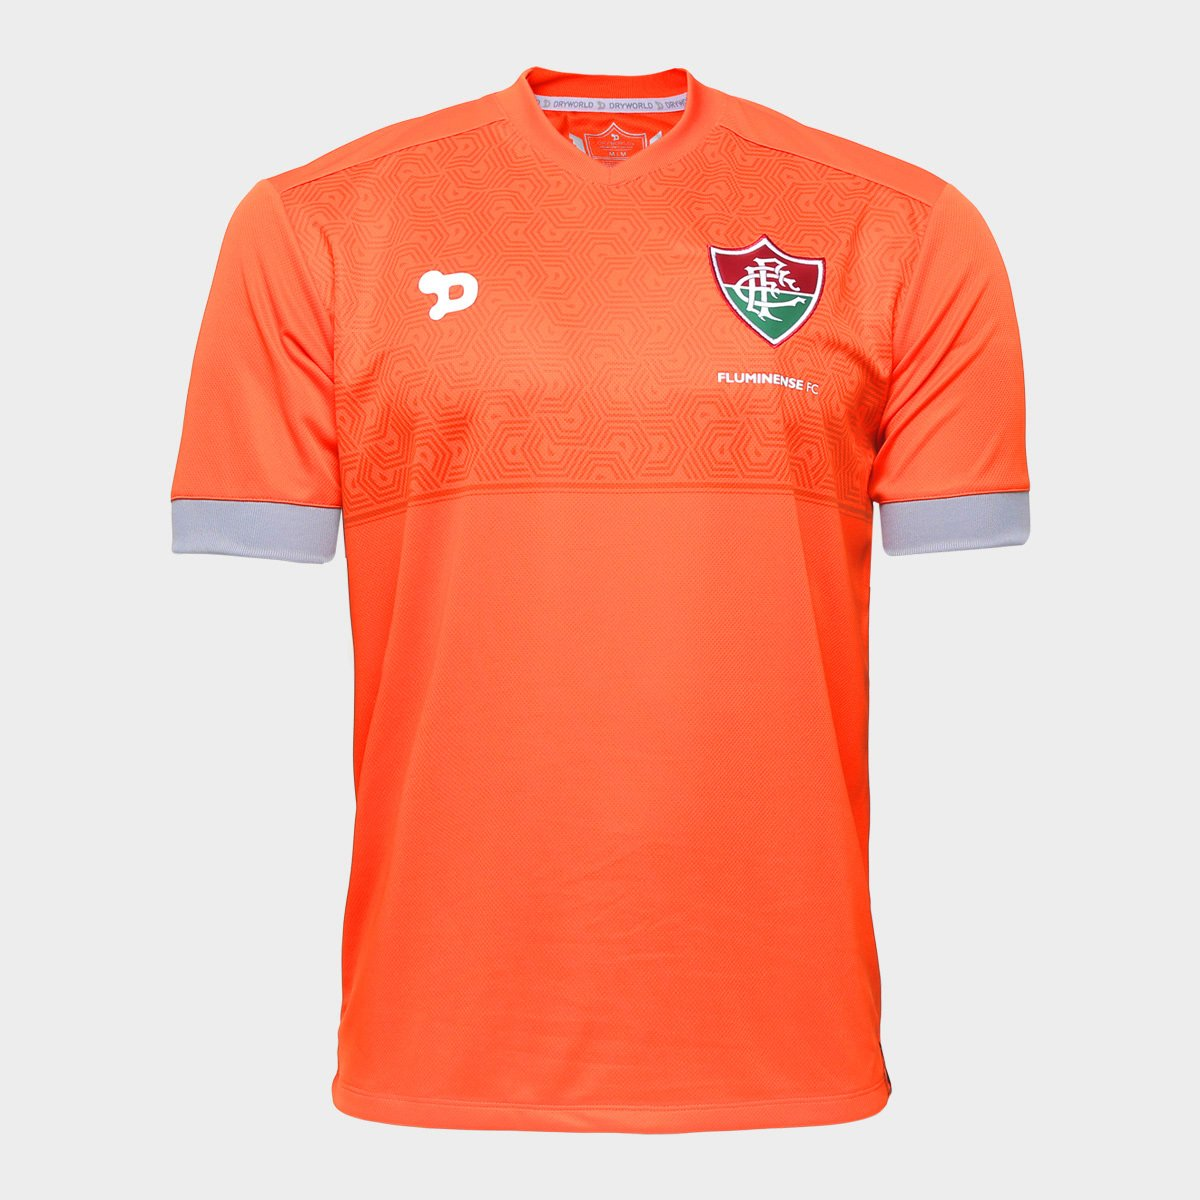 Camisa Dryworld Fluminense Treino Staff - Compre Agora  5a9f98161724d